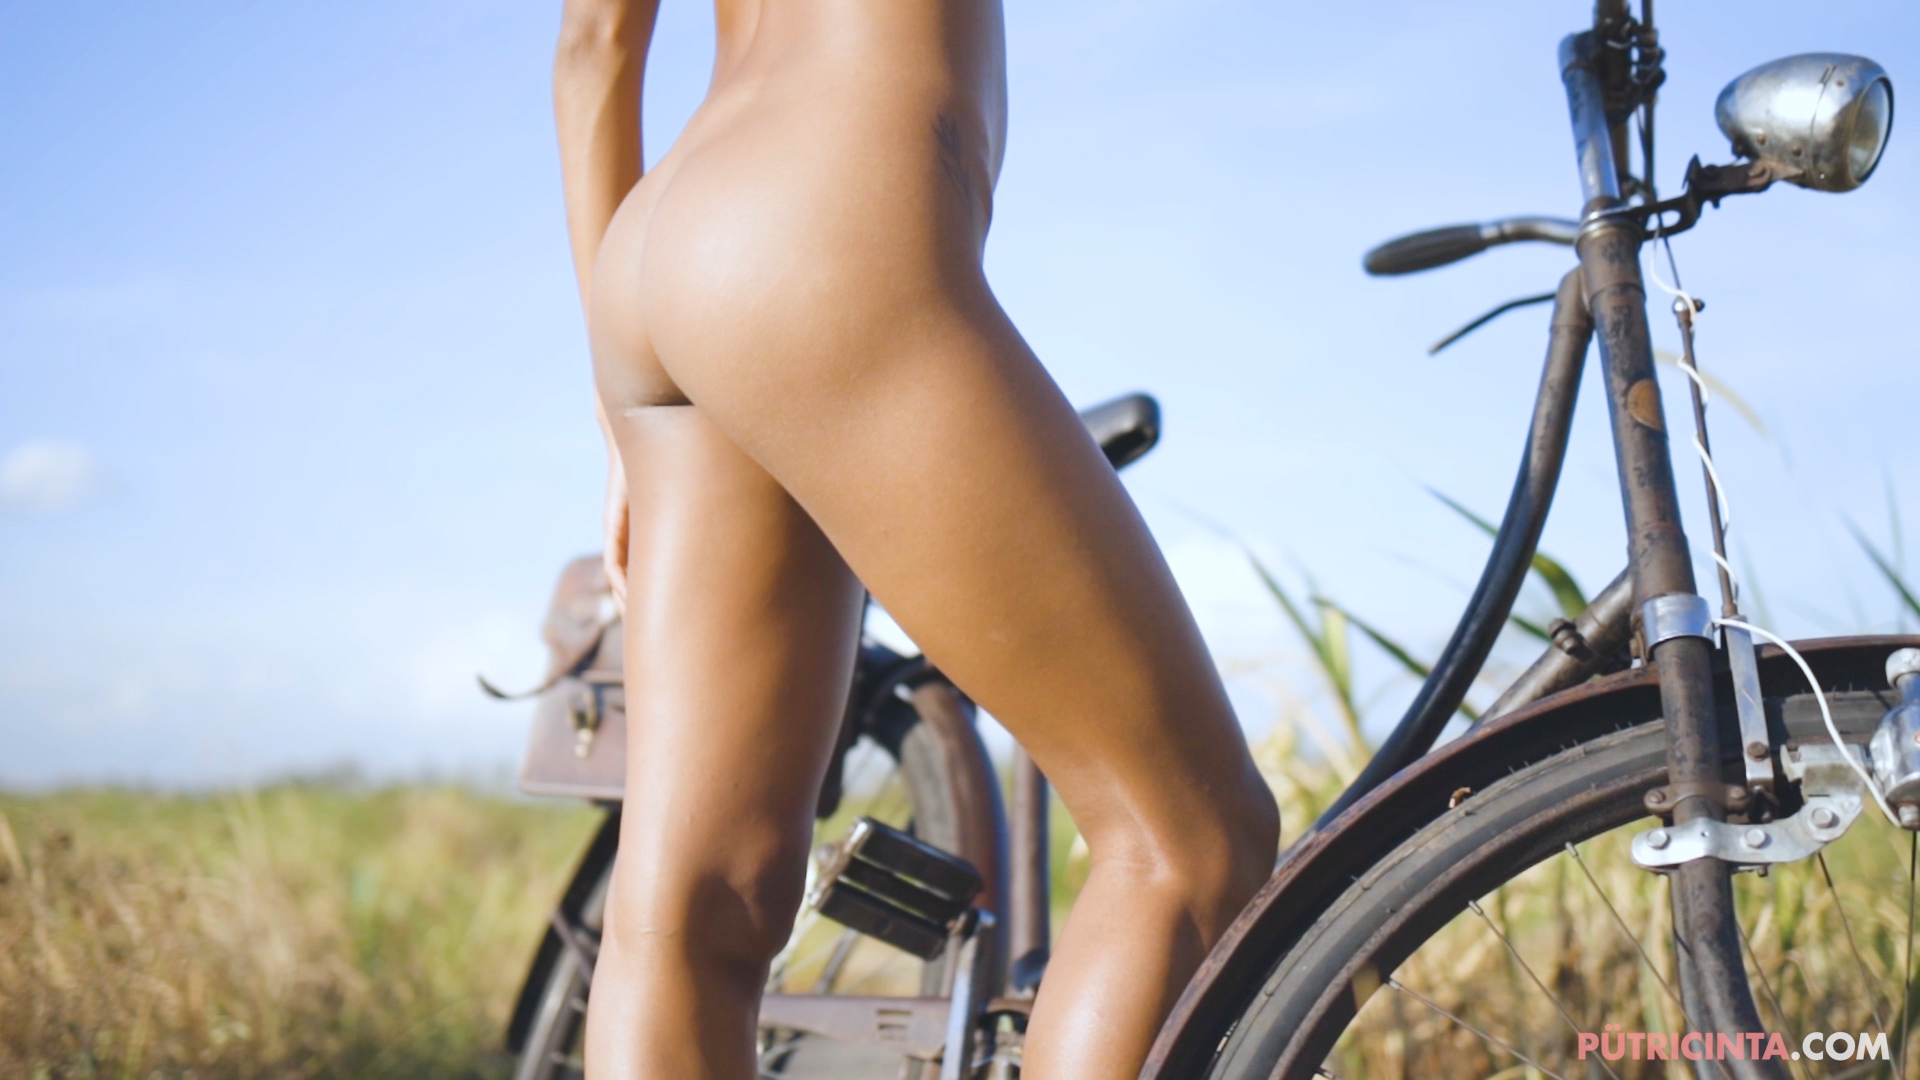 024-cyclingcommando-Putri-Cinta-teaser-stills-19.jpg